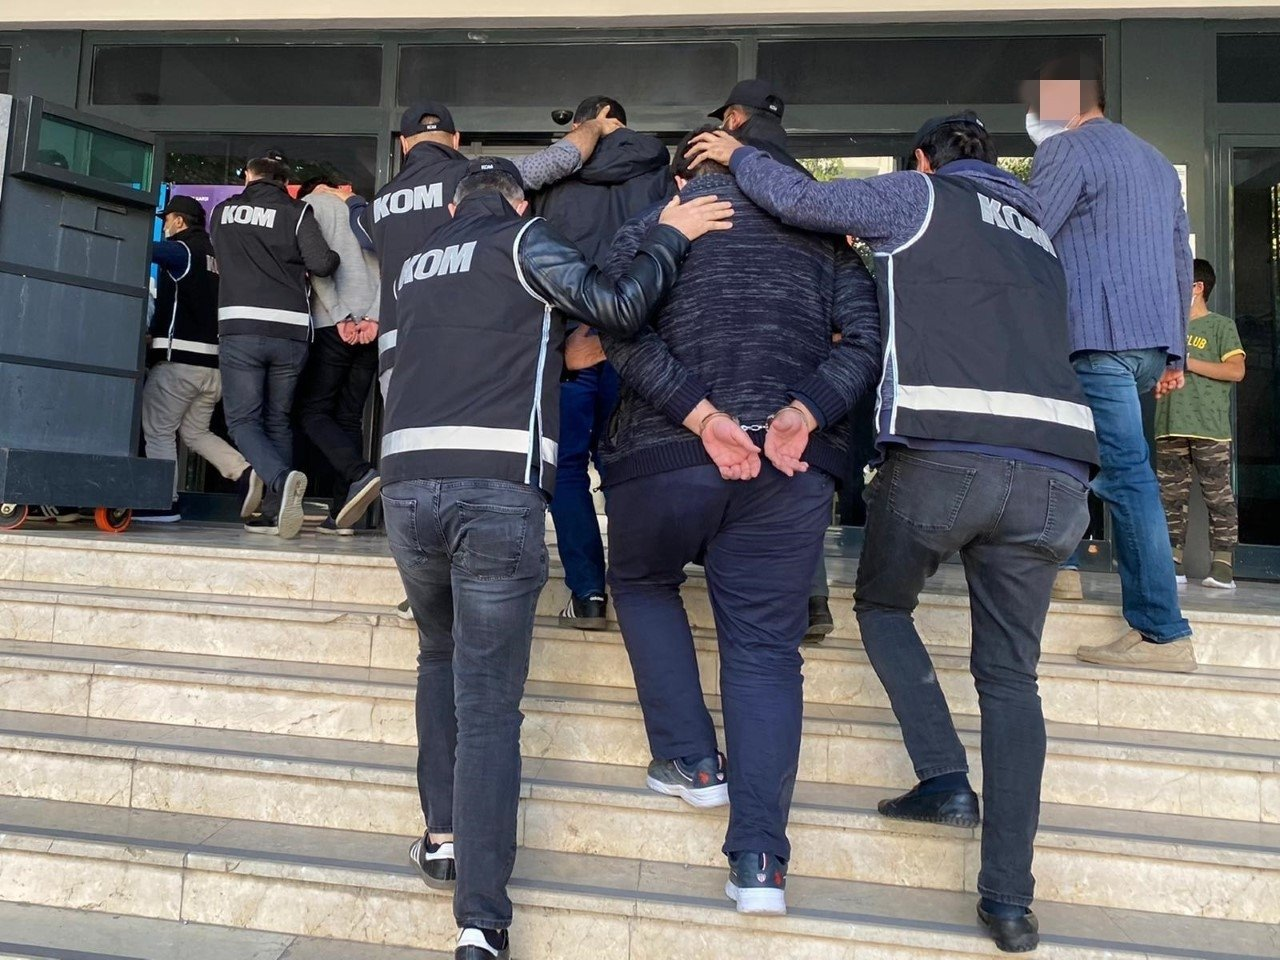 Police escort a captured FETÖ member in Malatya, eastern Turkey, Dec. 22, 2020. (IHA Photo)